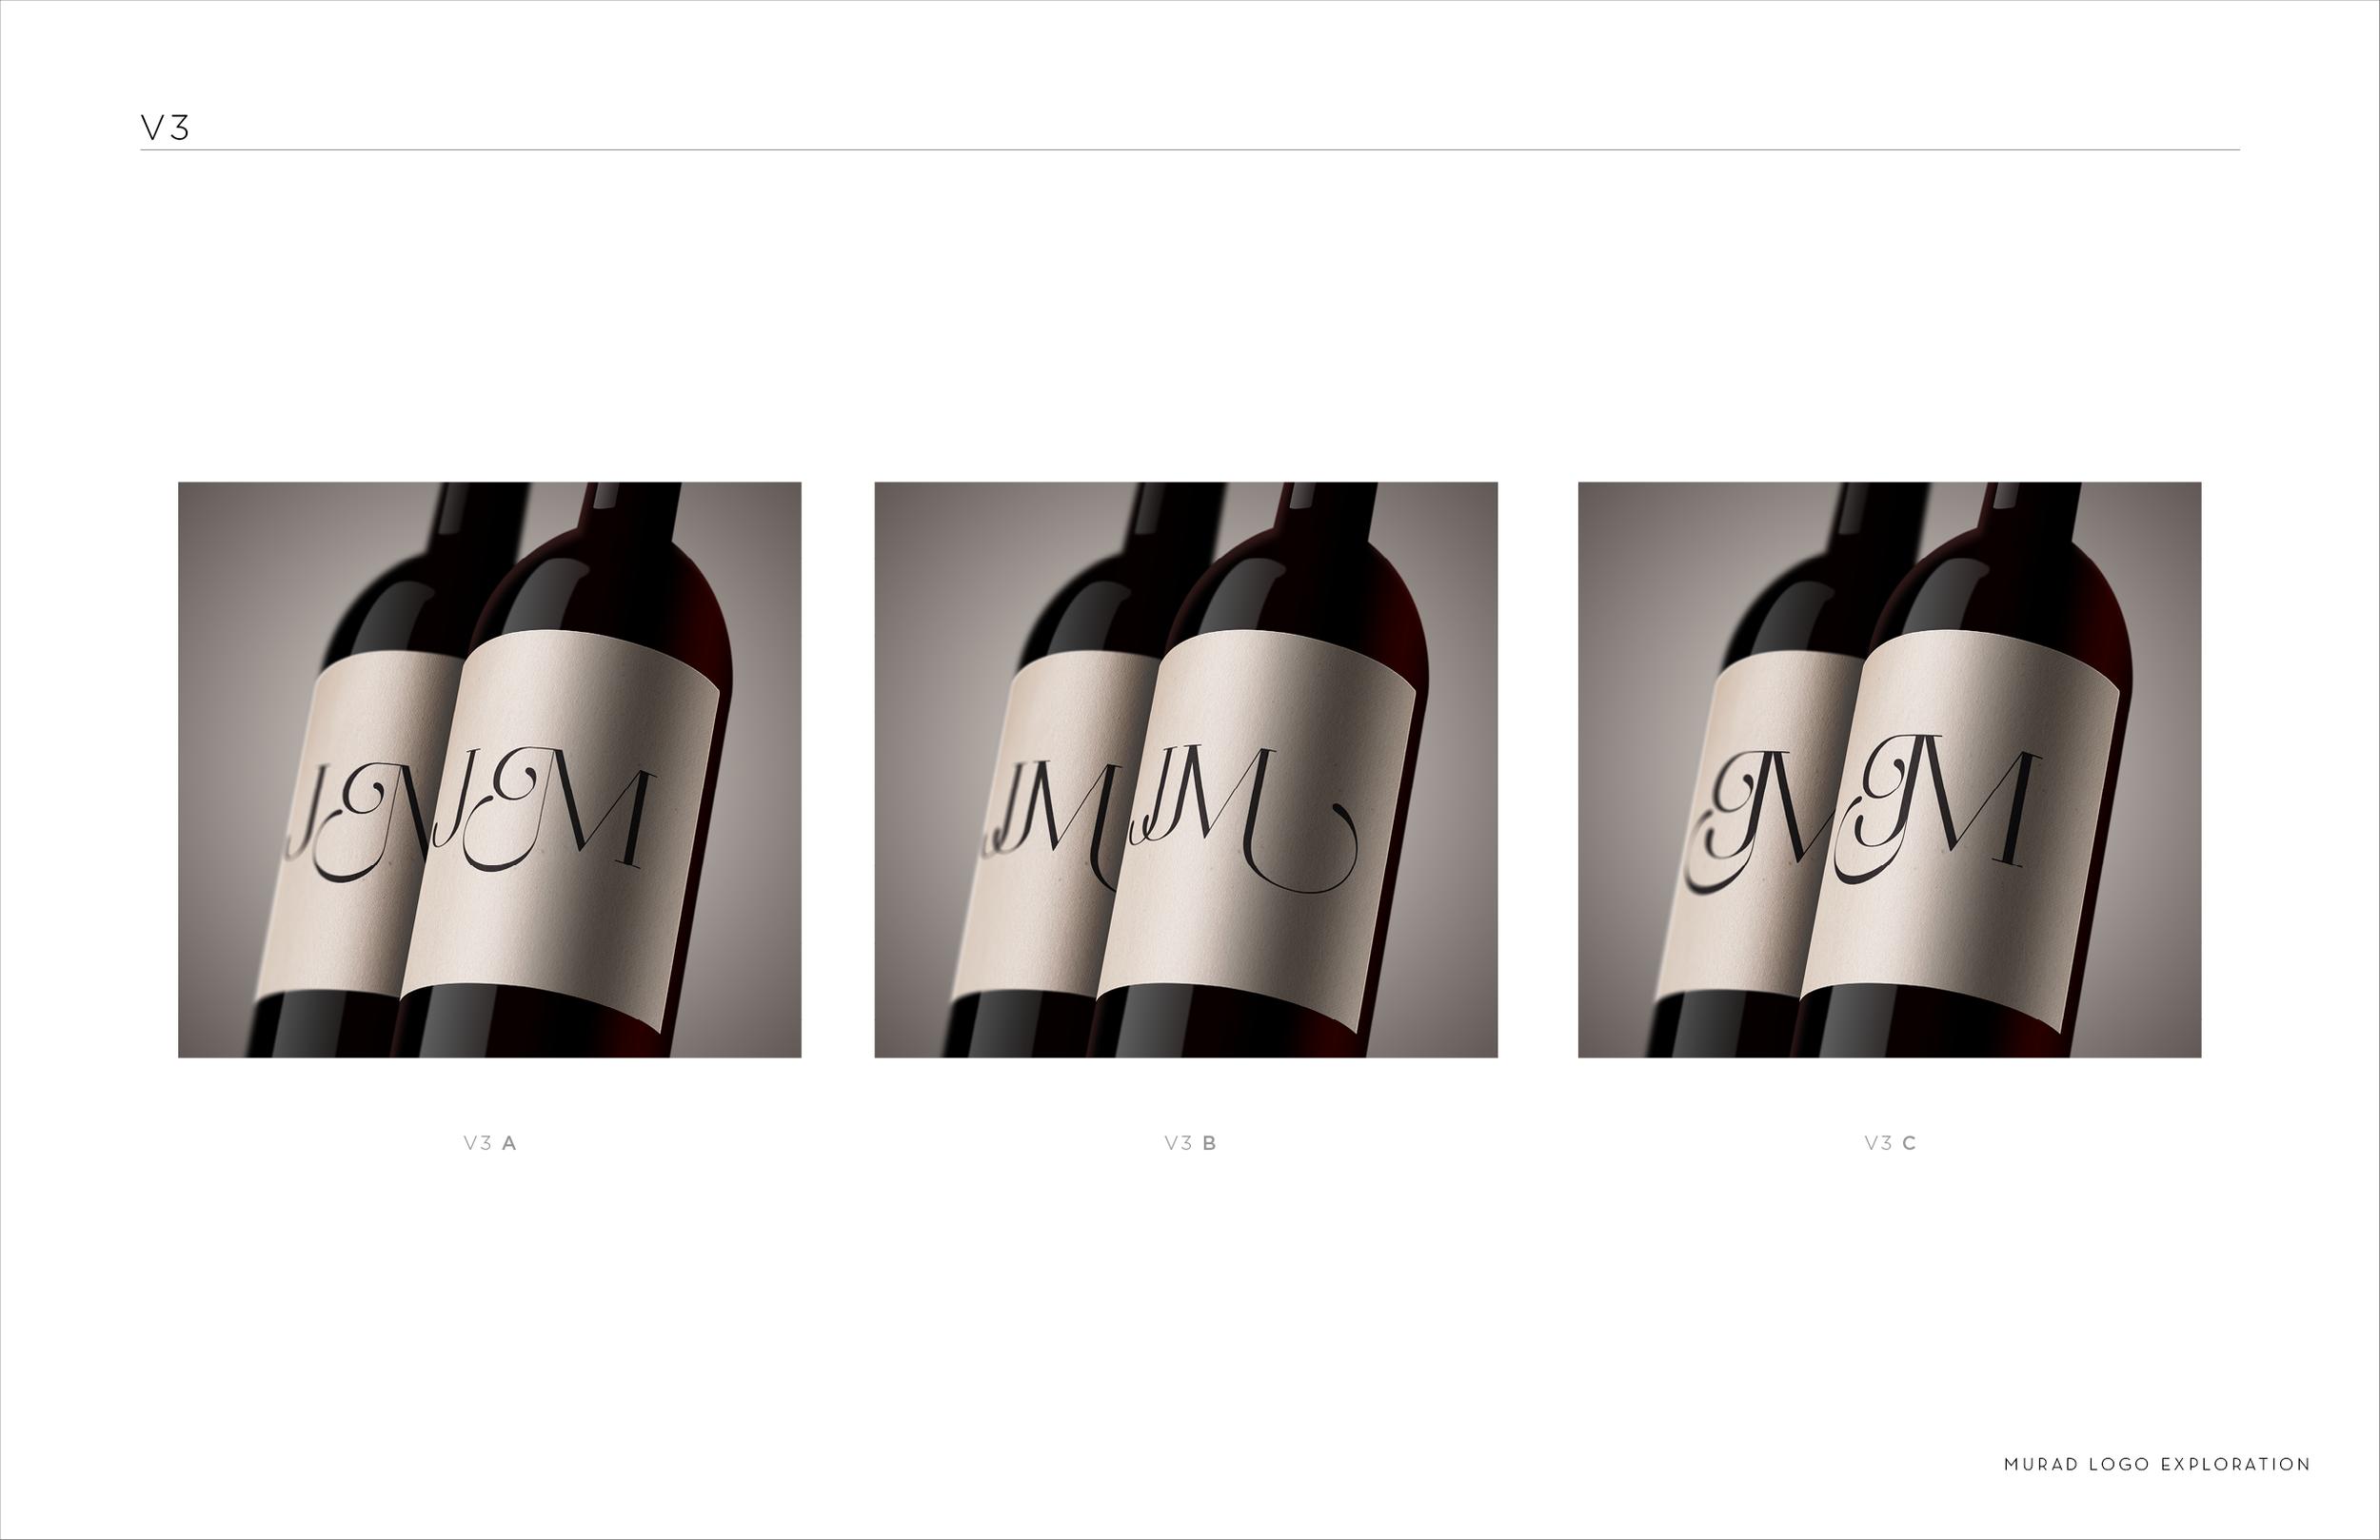 Miss-Vu_Murad_Wine_Logo_Exploration_7.png